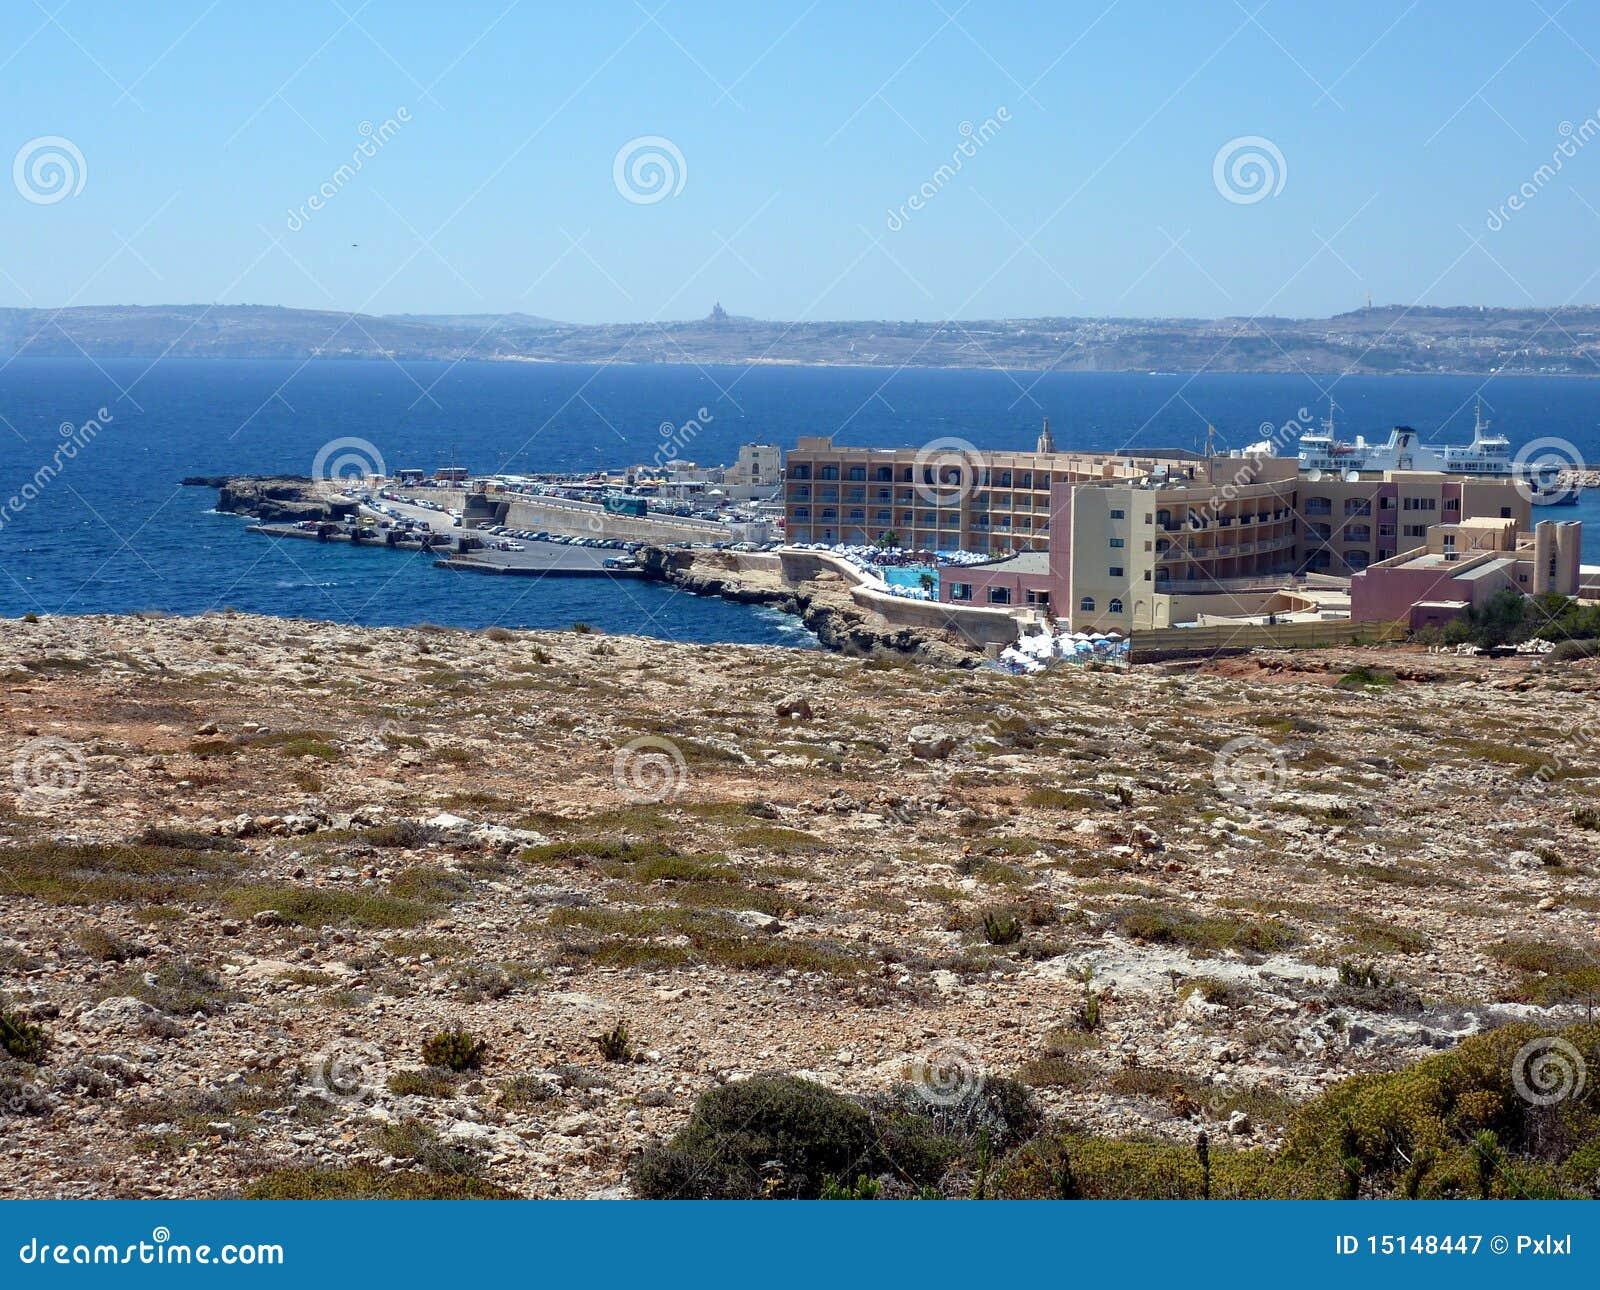 Cirkewwa Malta  city photo : Cirkewwa ferry terminal in the north of Malta island, Europe. Ferries ...